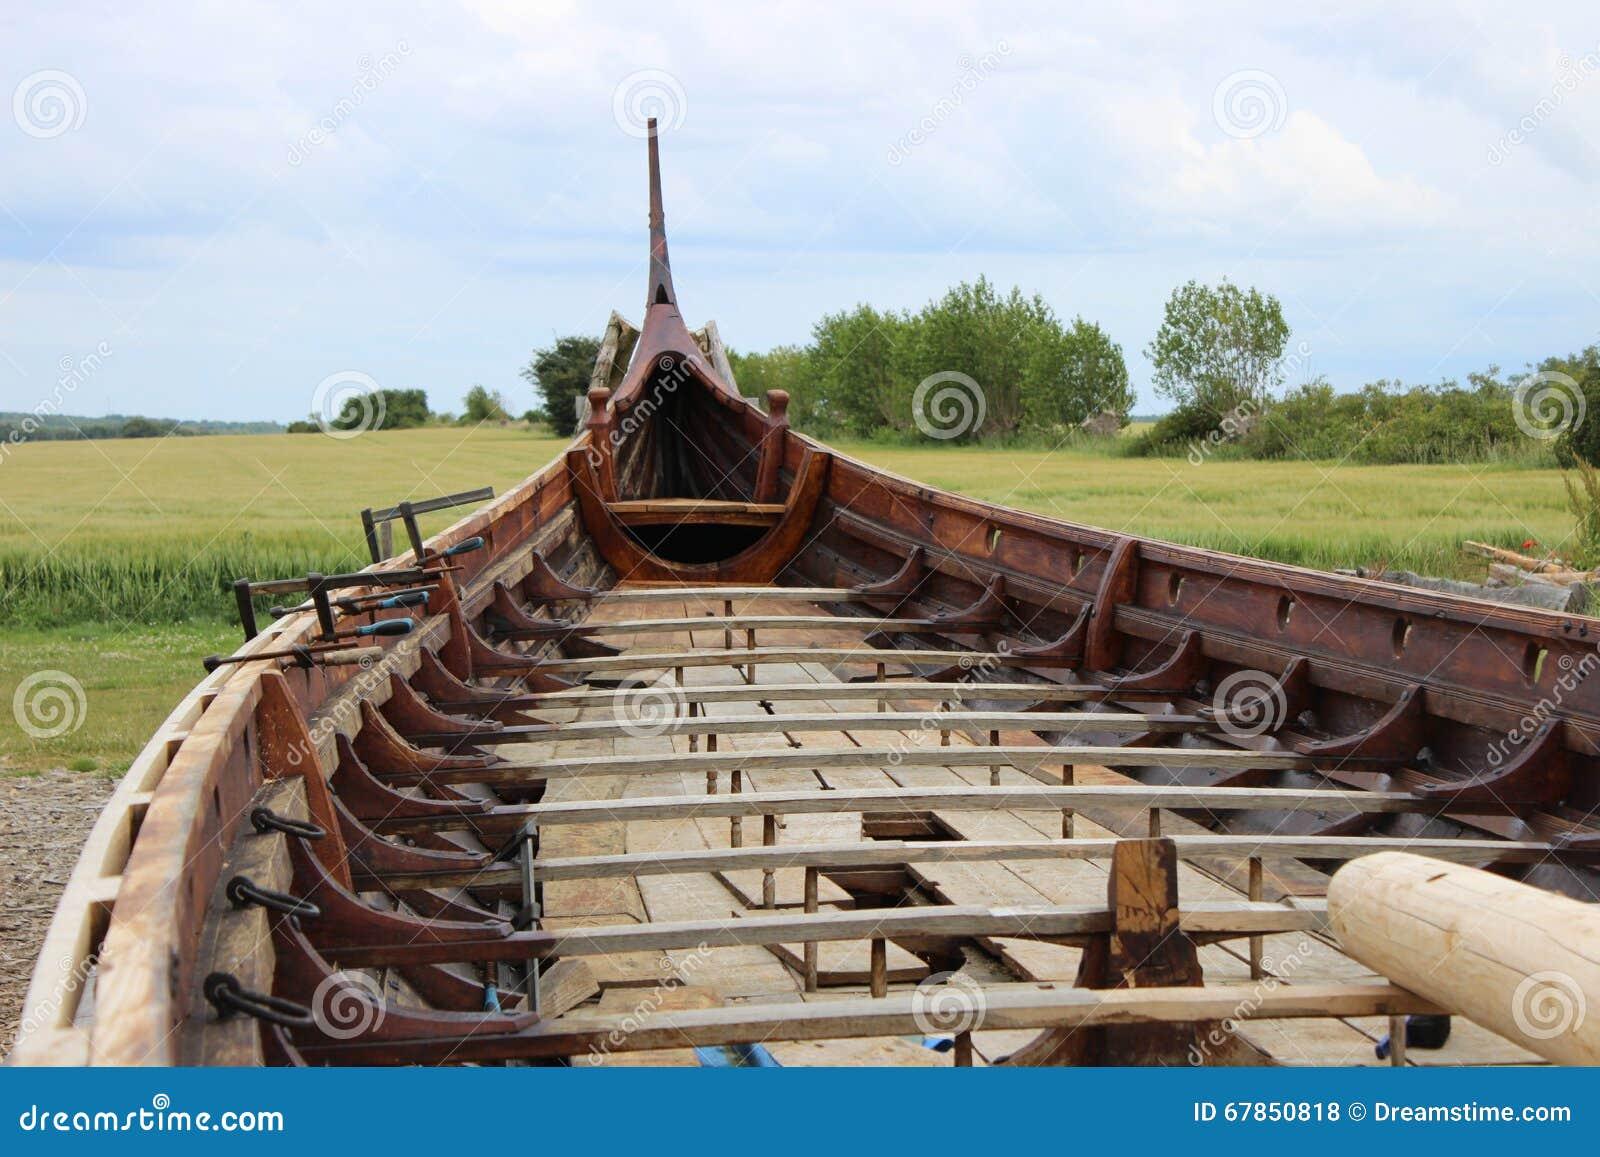 Viking ship stock photo. Image of building, knarr, replica - 67850818